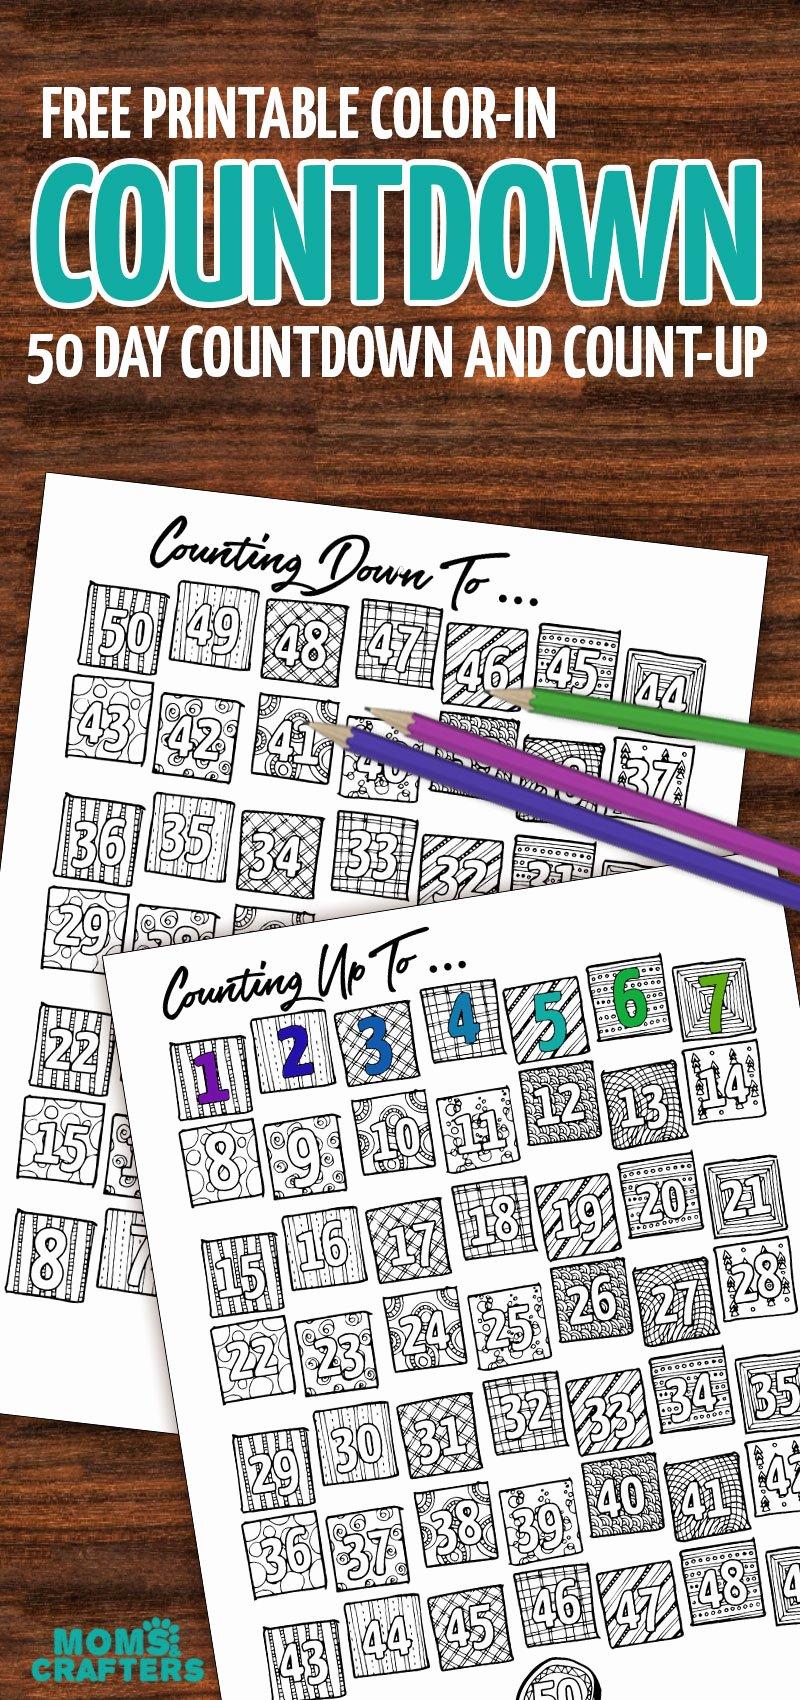 Printable Countdown Calendar Template Awesome Printable Countdown Calendar and Progress Tracker – Color